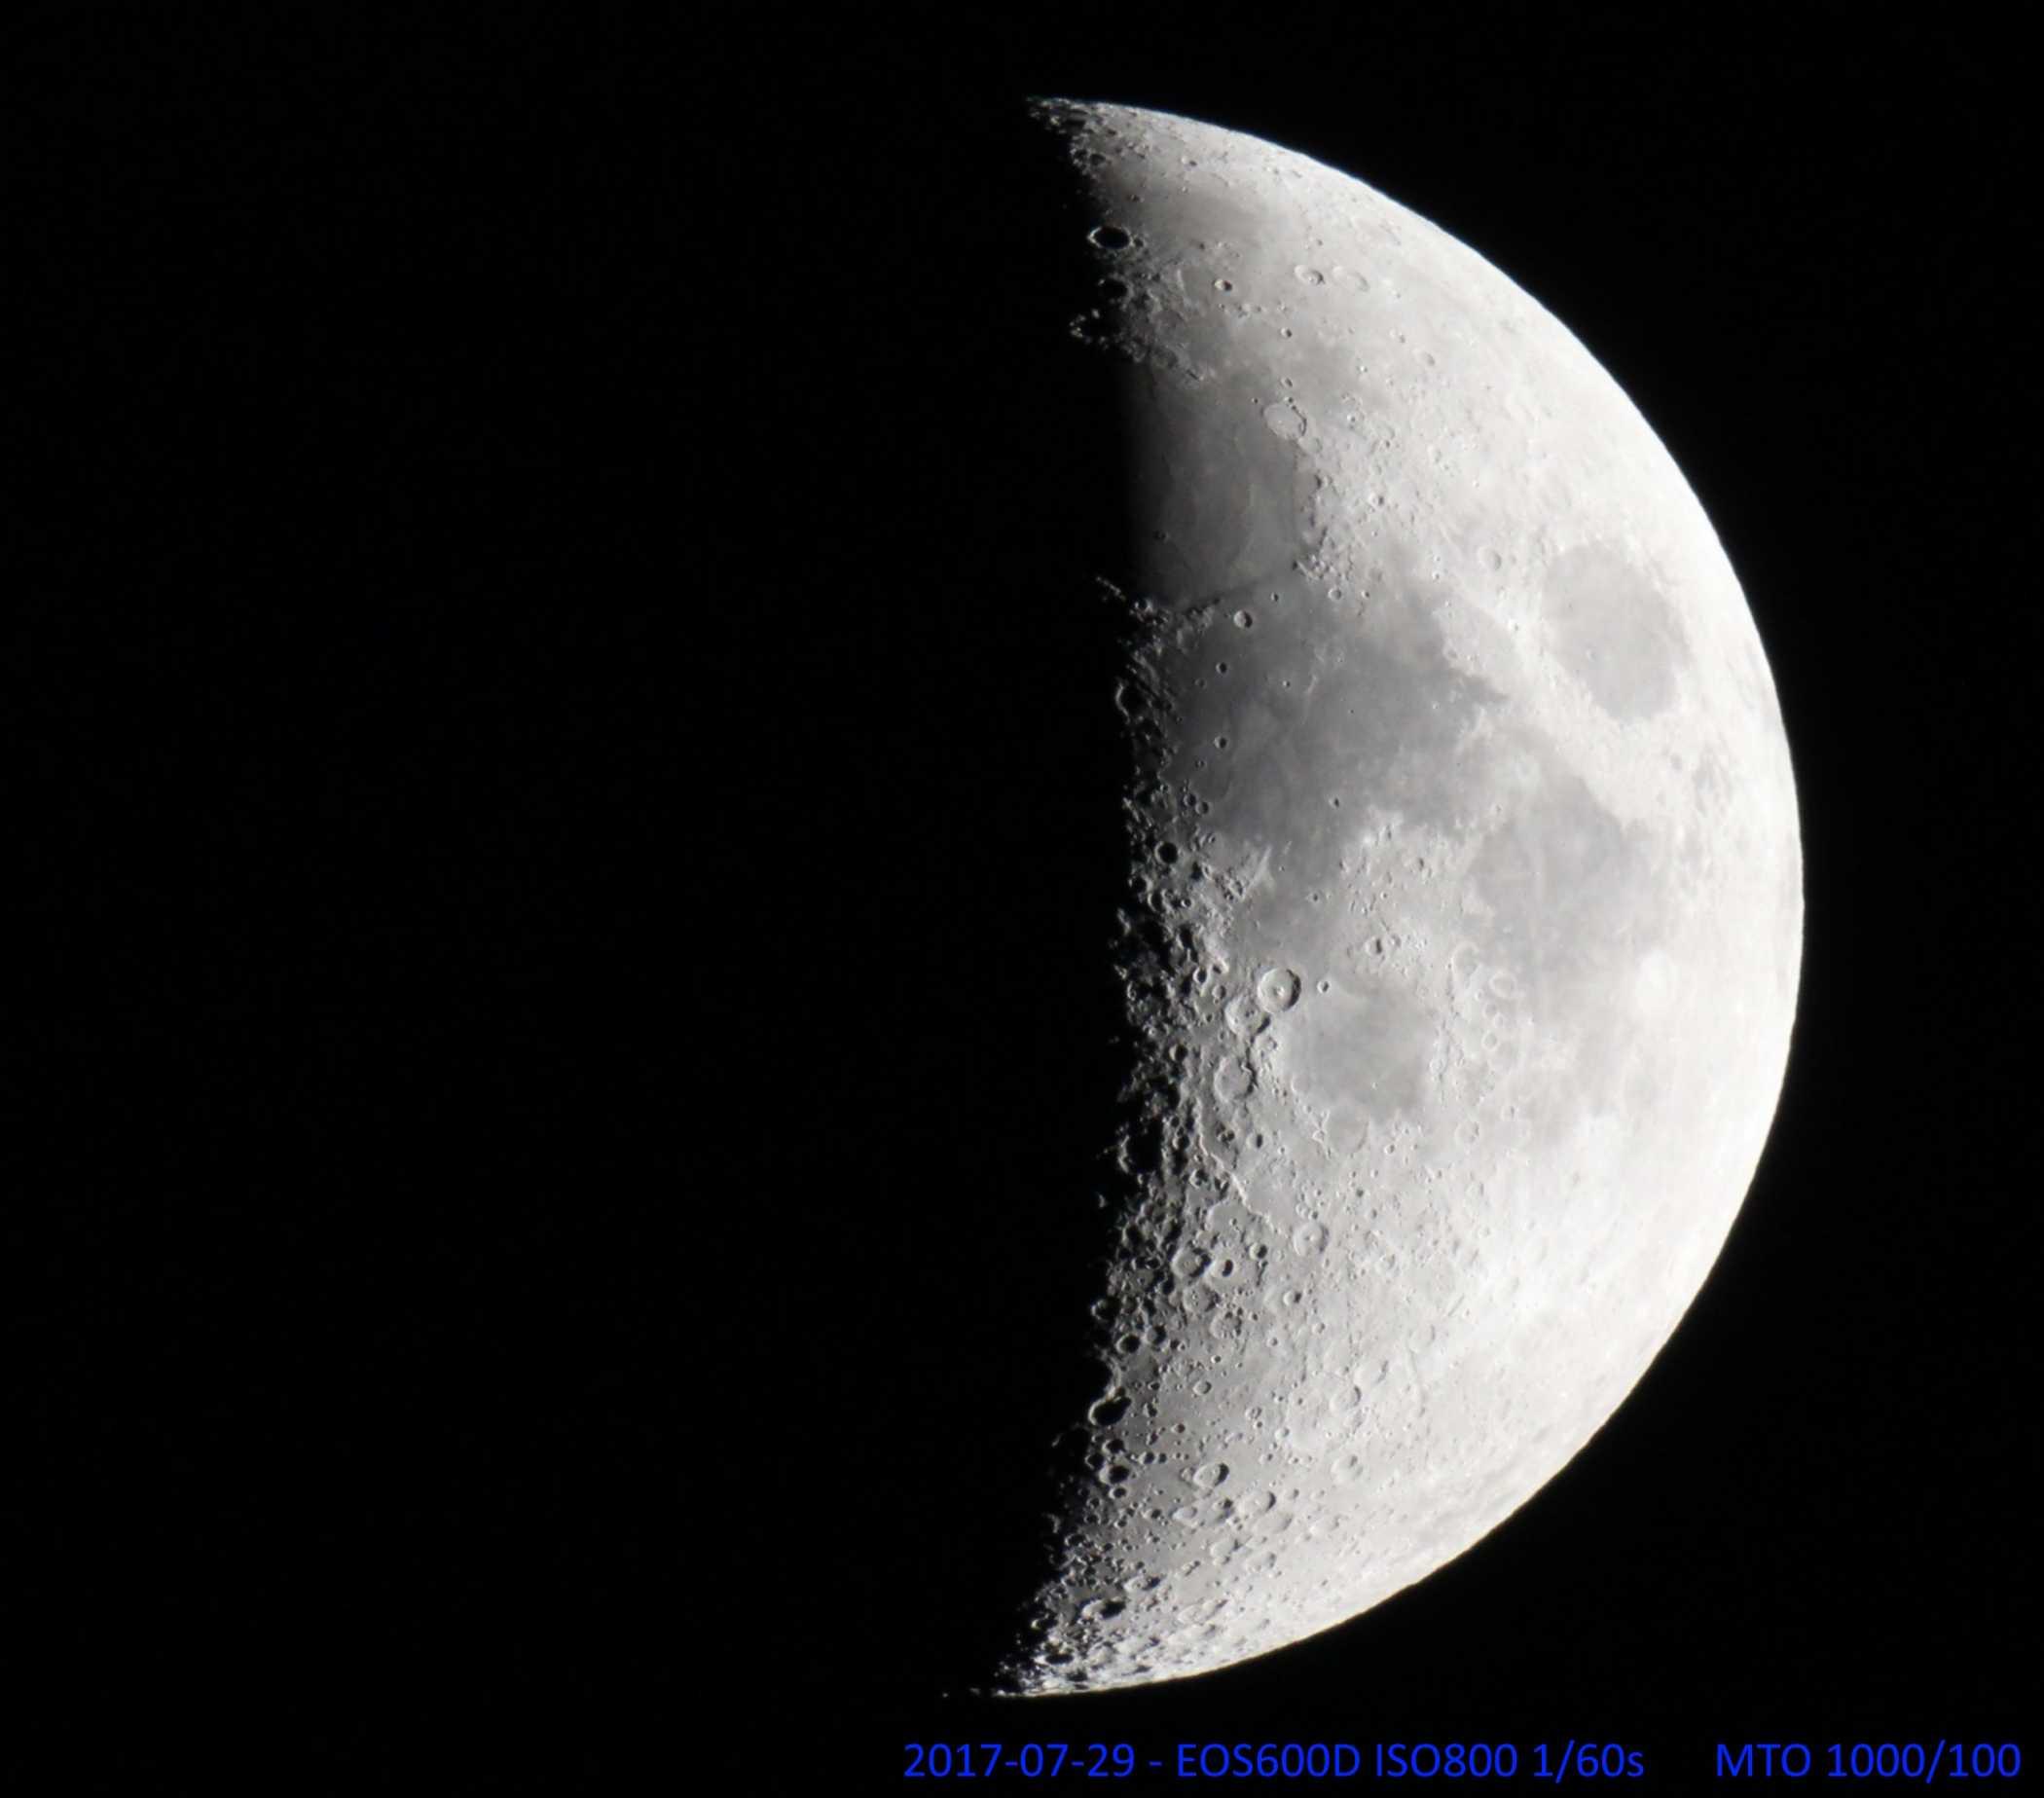 Mond_am_29.07.2017_EOS600D_ISO800_1/60s_1000mm_MTO_F/10.jpg